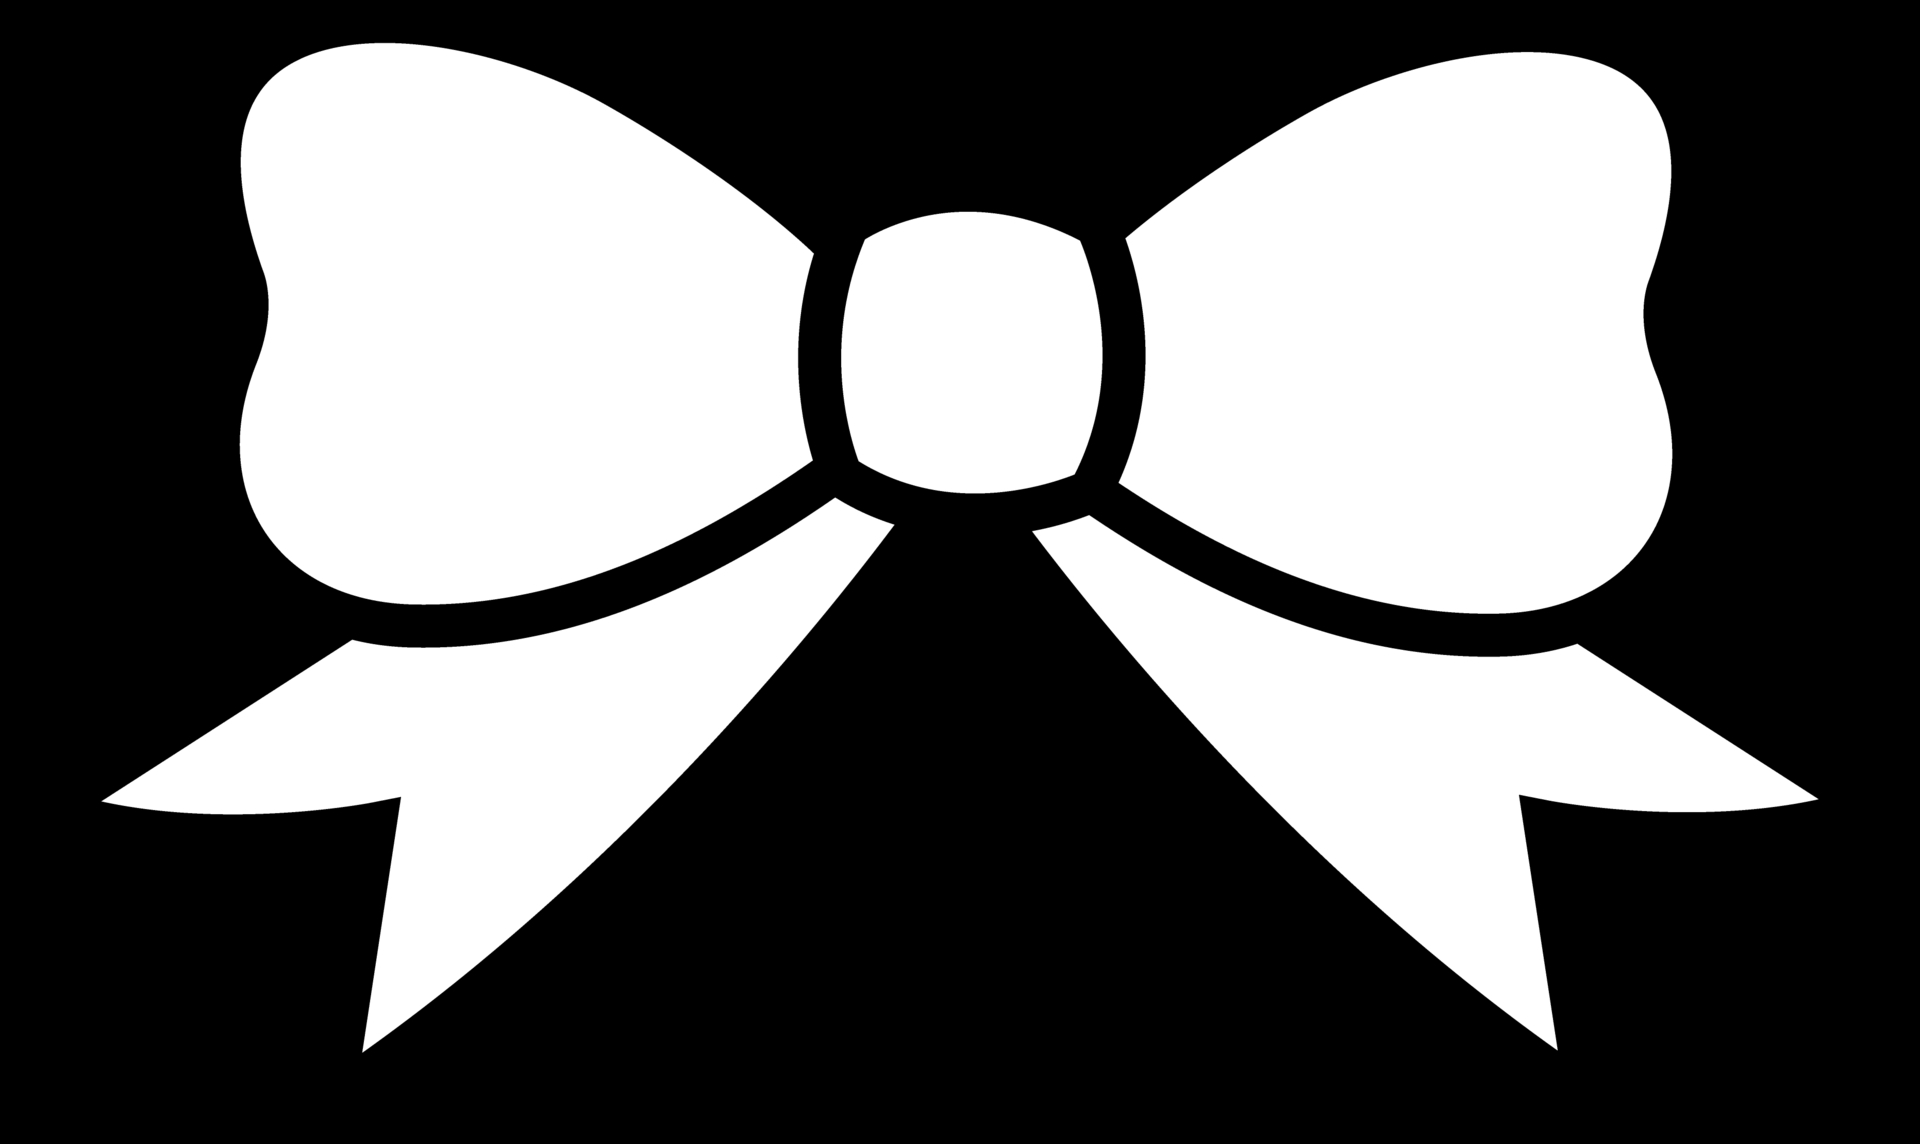 Minnie Mouse Hair Bow Clip Art.